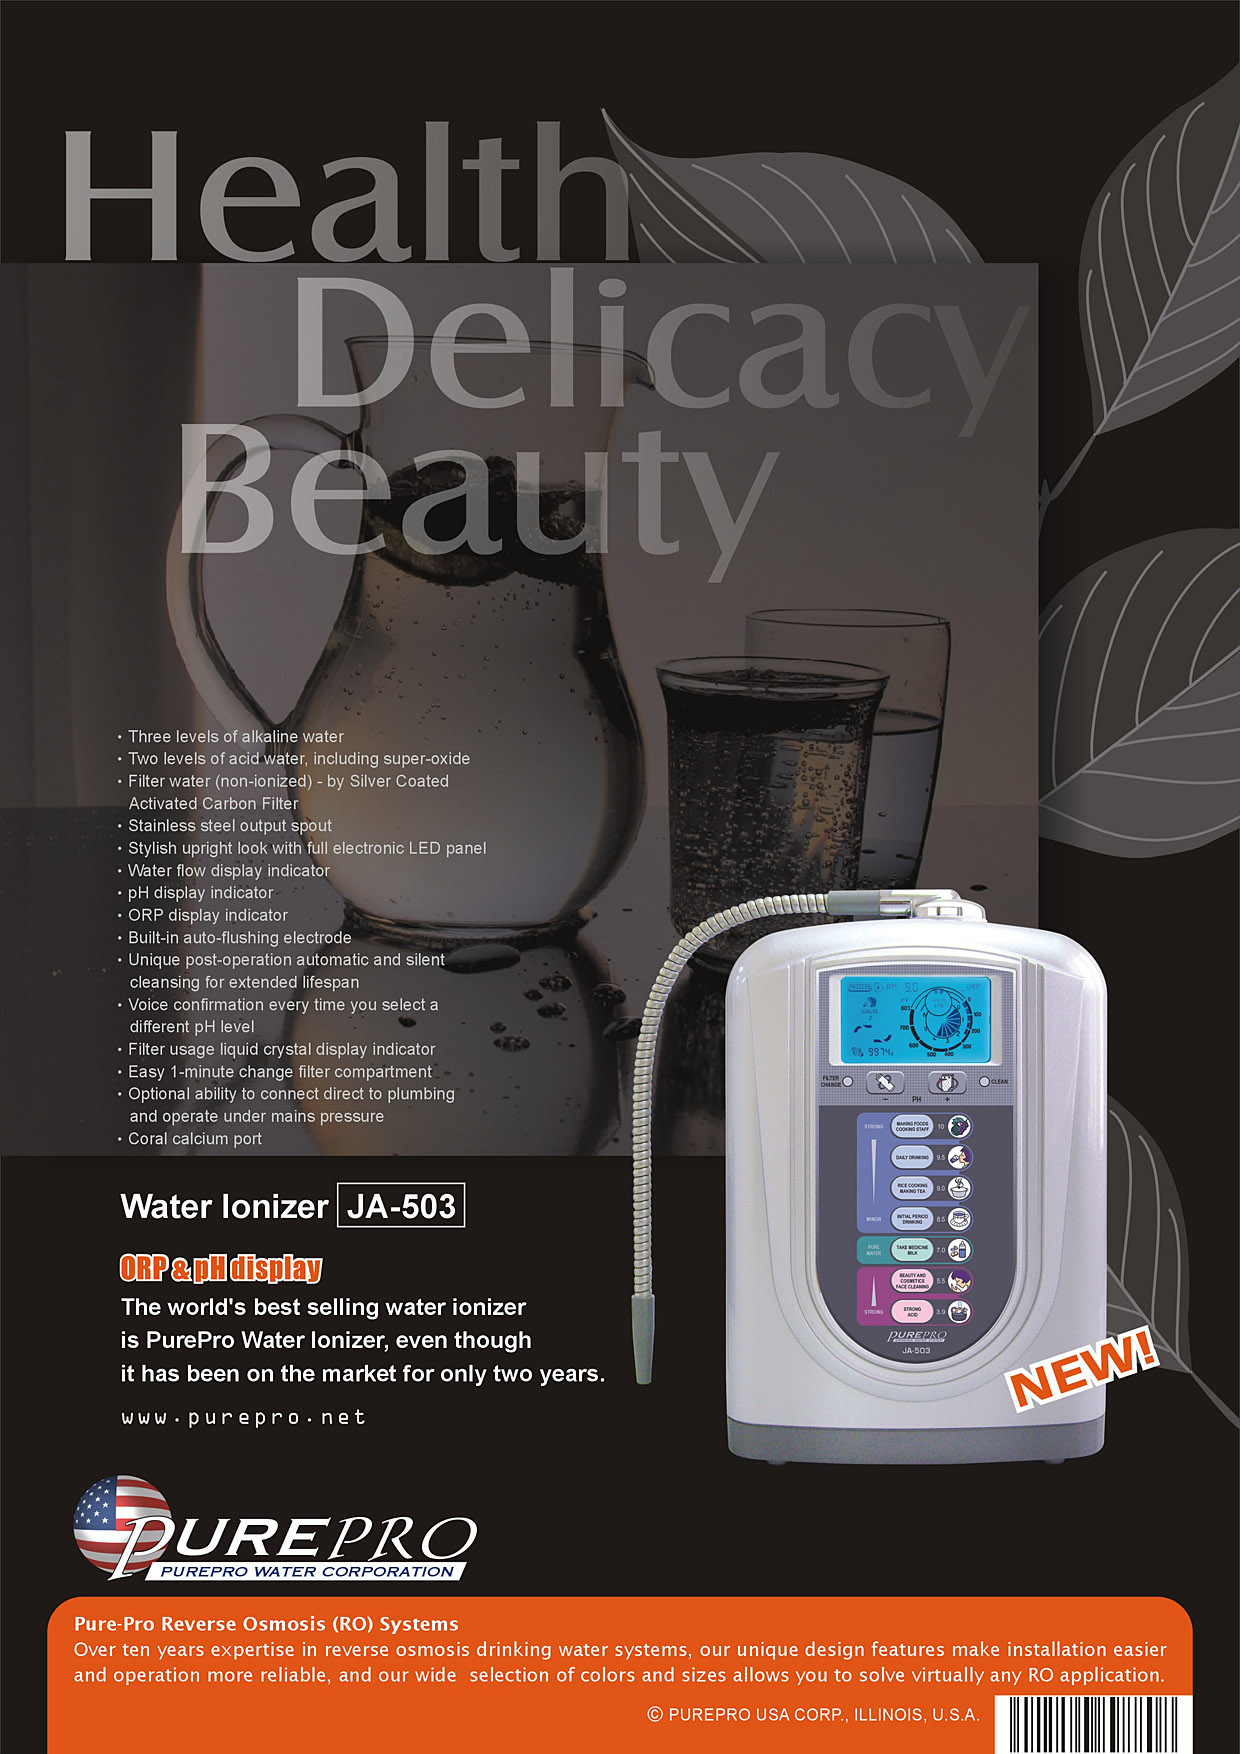 PurePro USA Water Ionizer JA-503